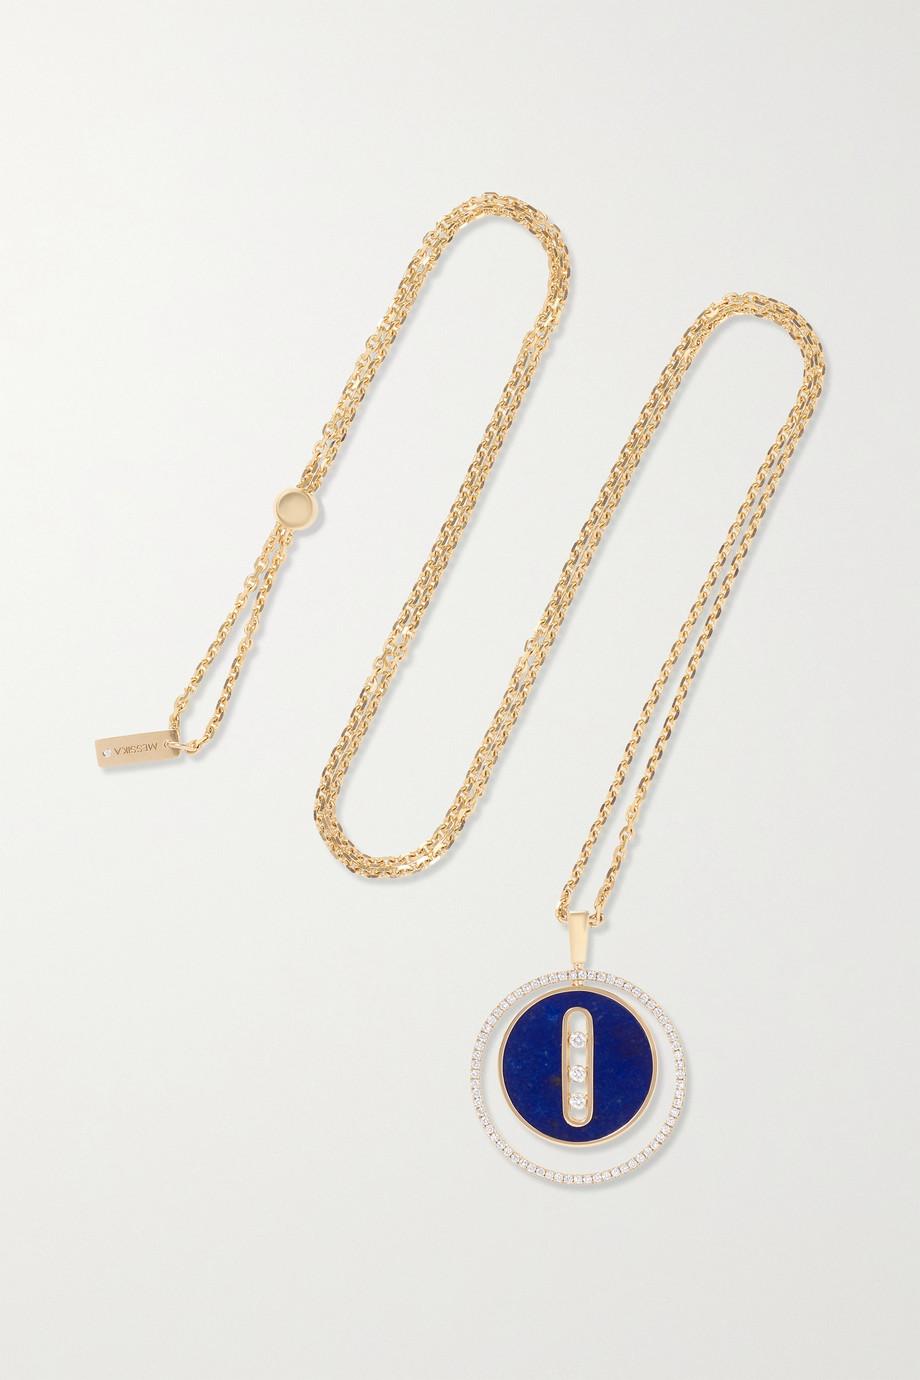 Messika Collier en or 18 carats, lapis-lazuli et diamants Lucky Move